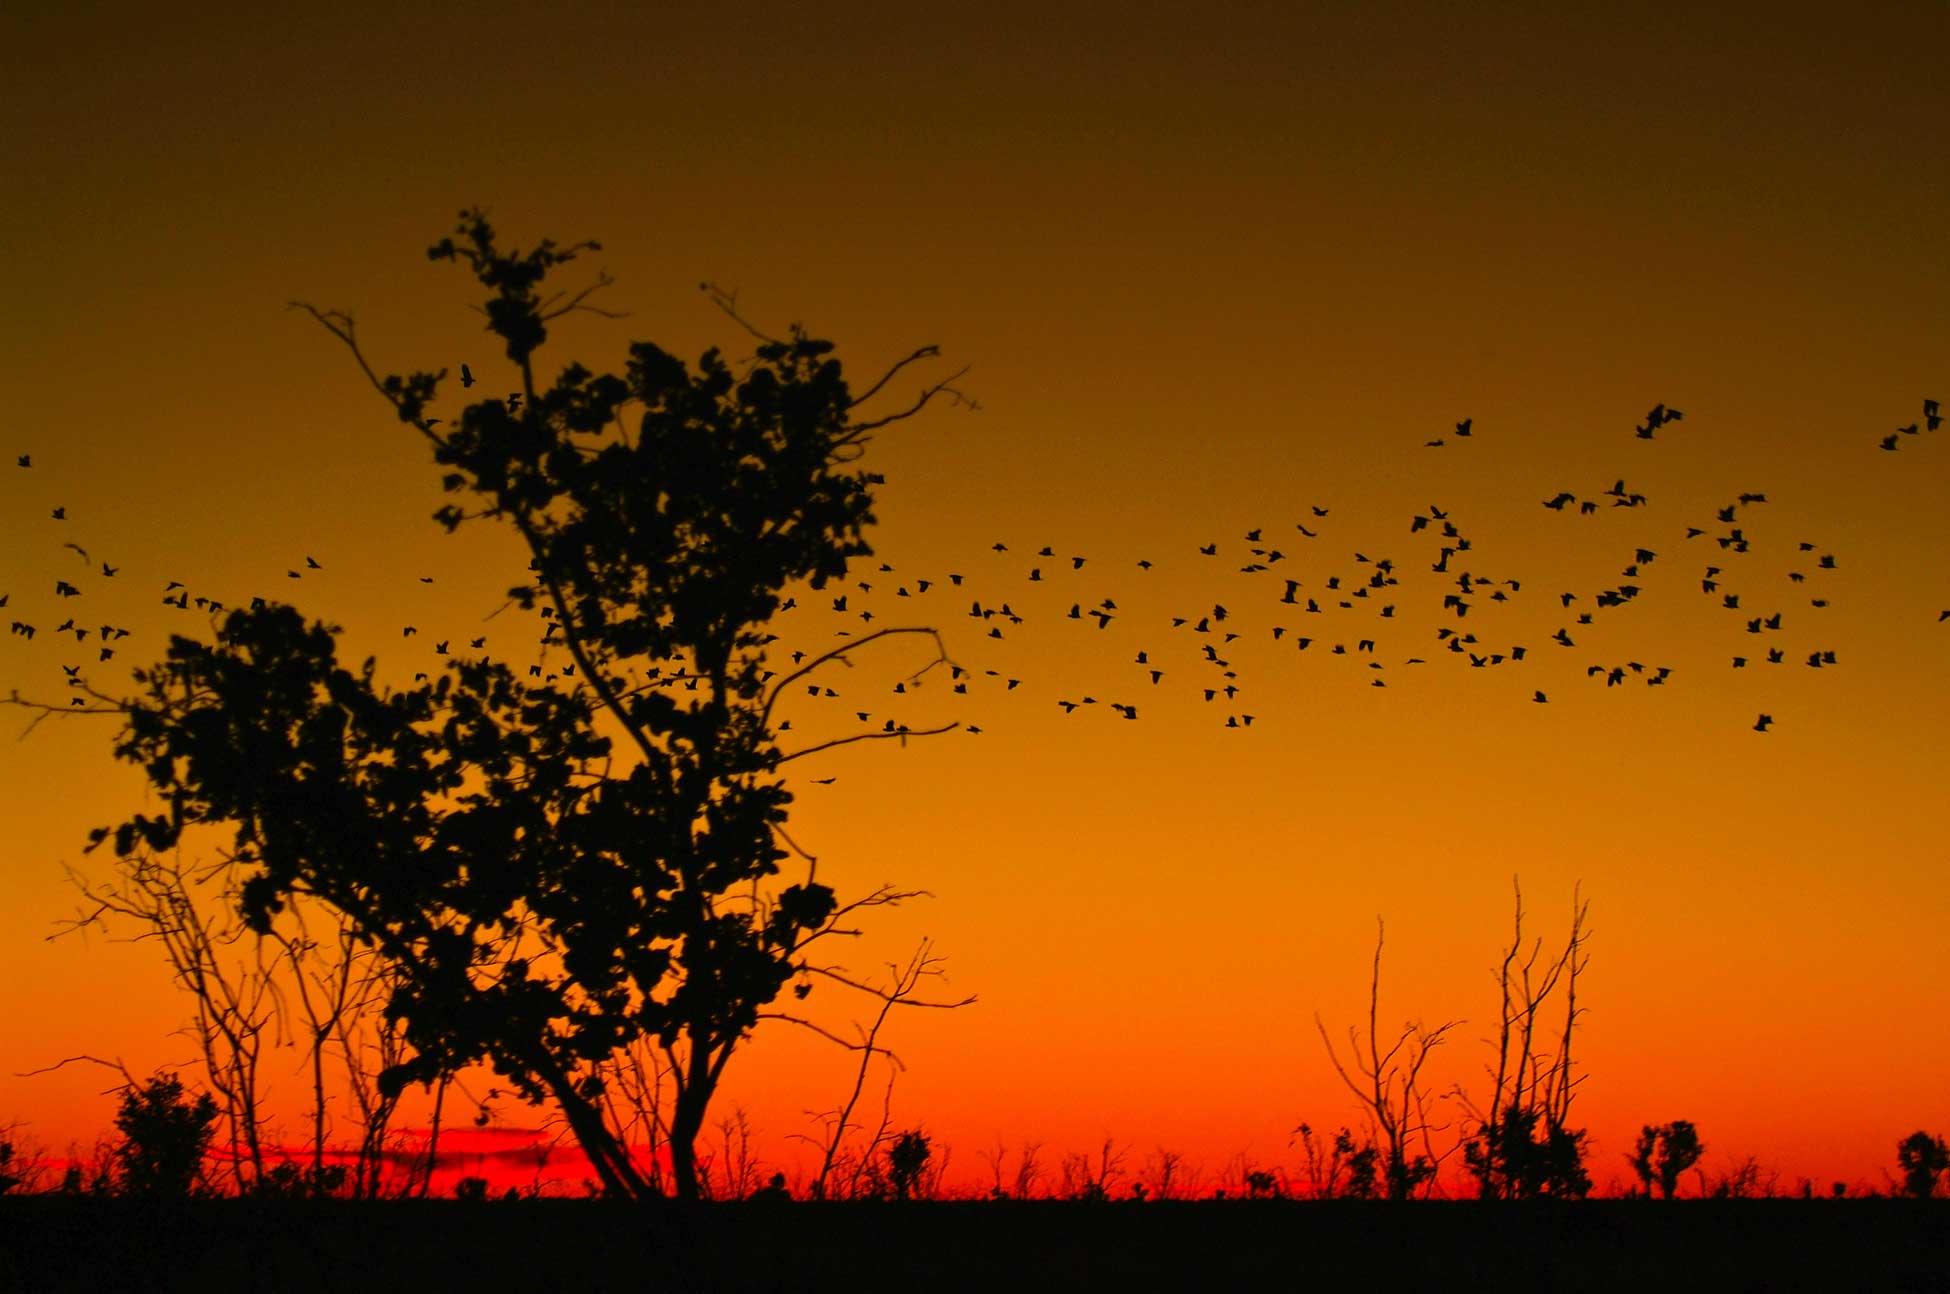 Outback am Abend, Australien